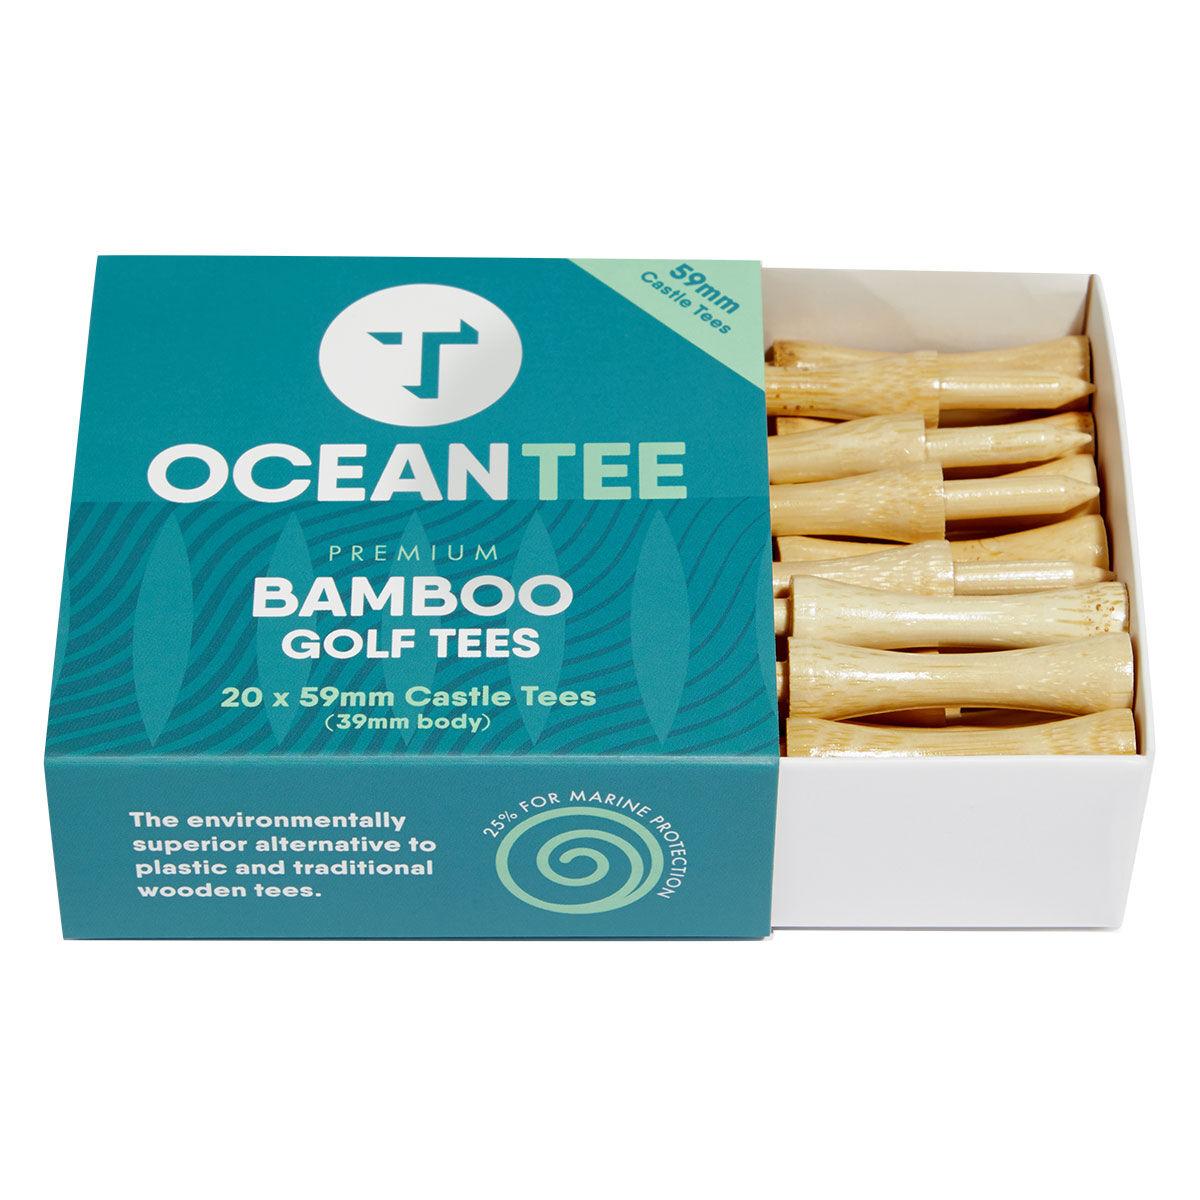 Ocean Tee Mens Brown Pack of 20 Bamboo Castle Golf Tees, Size: 59mm | American Golf